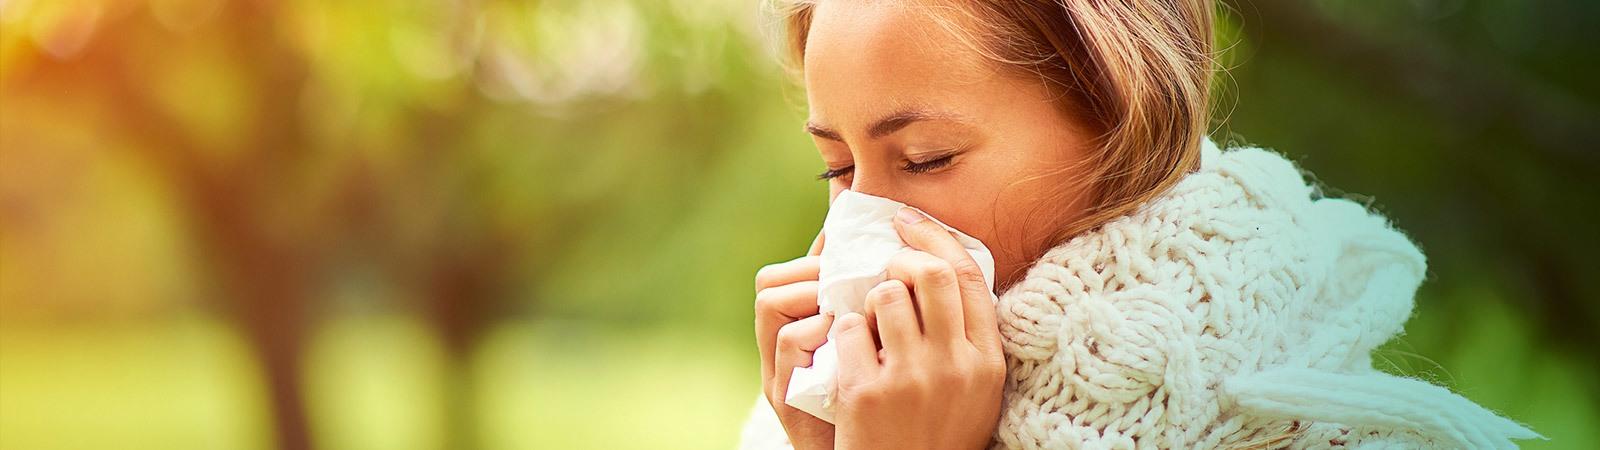 influenza difese immunitarie